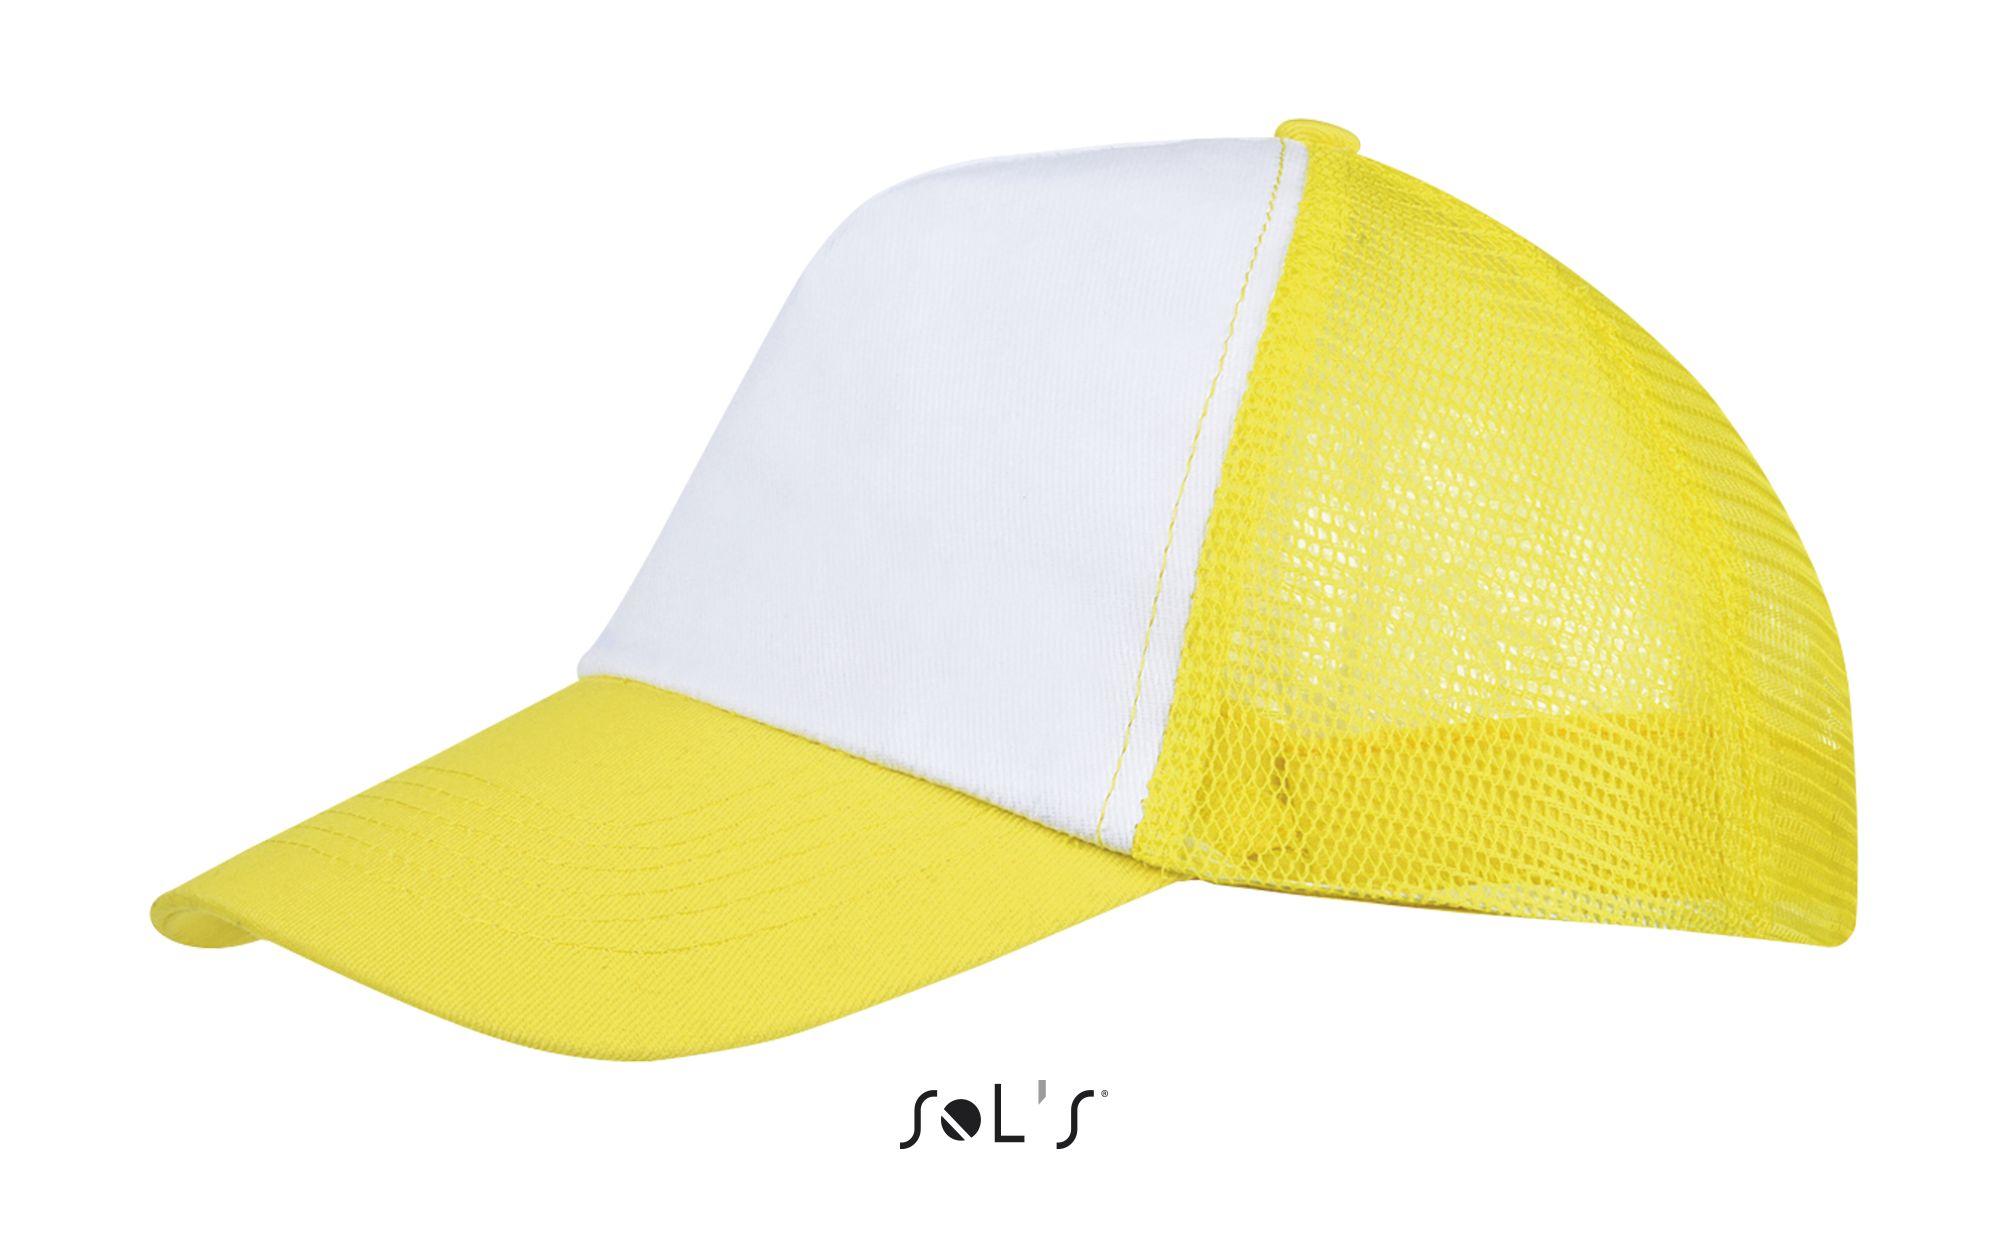 905 - Blanc / Citron